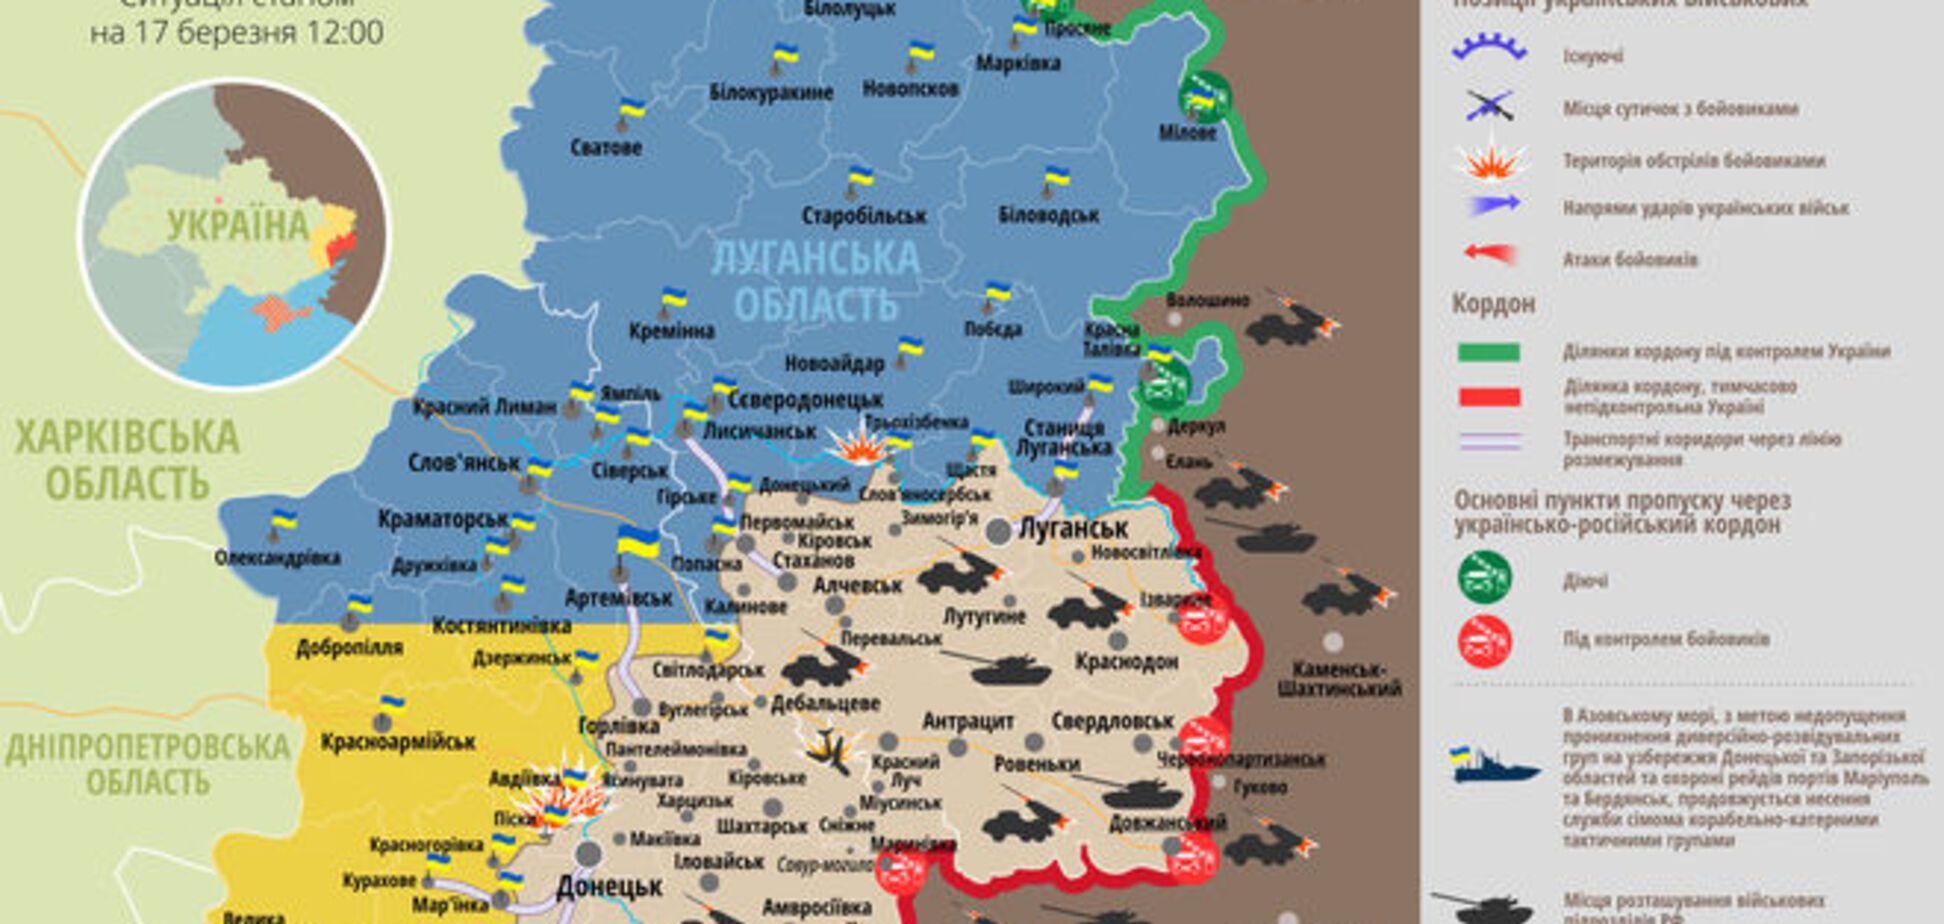 Боевики на Донбассе пускают в ход танки и артиллерию: карта АТО